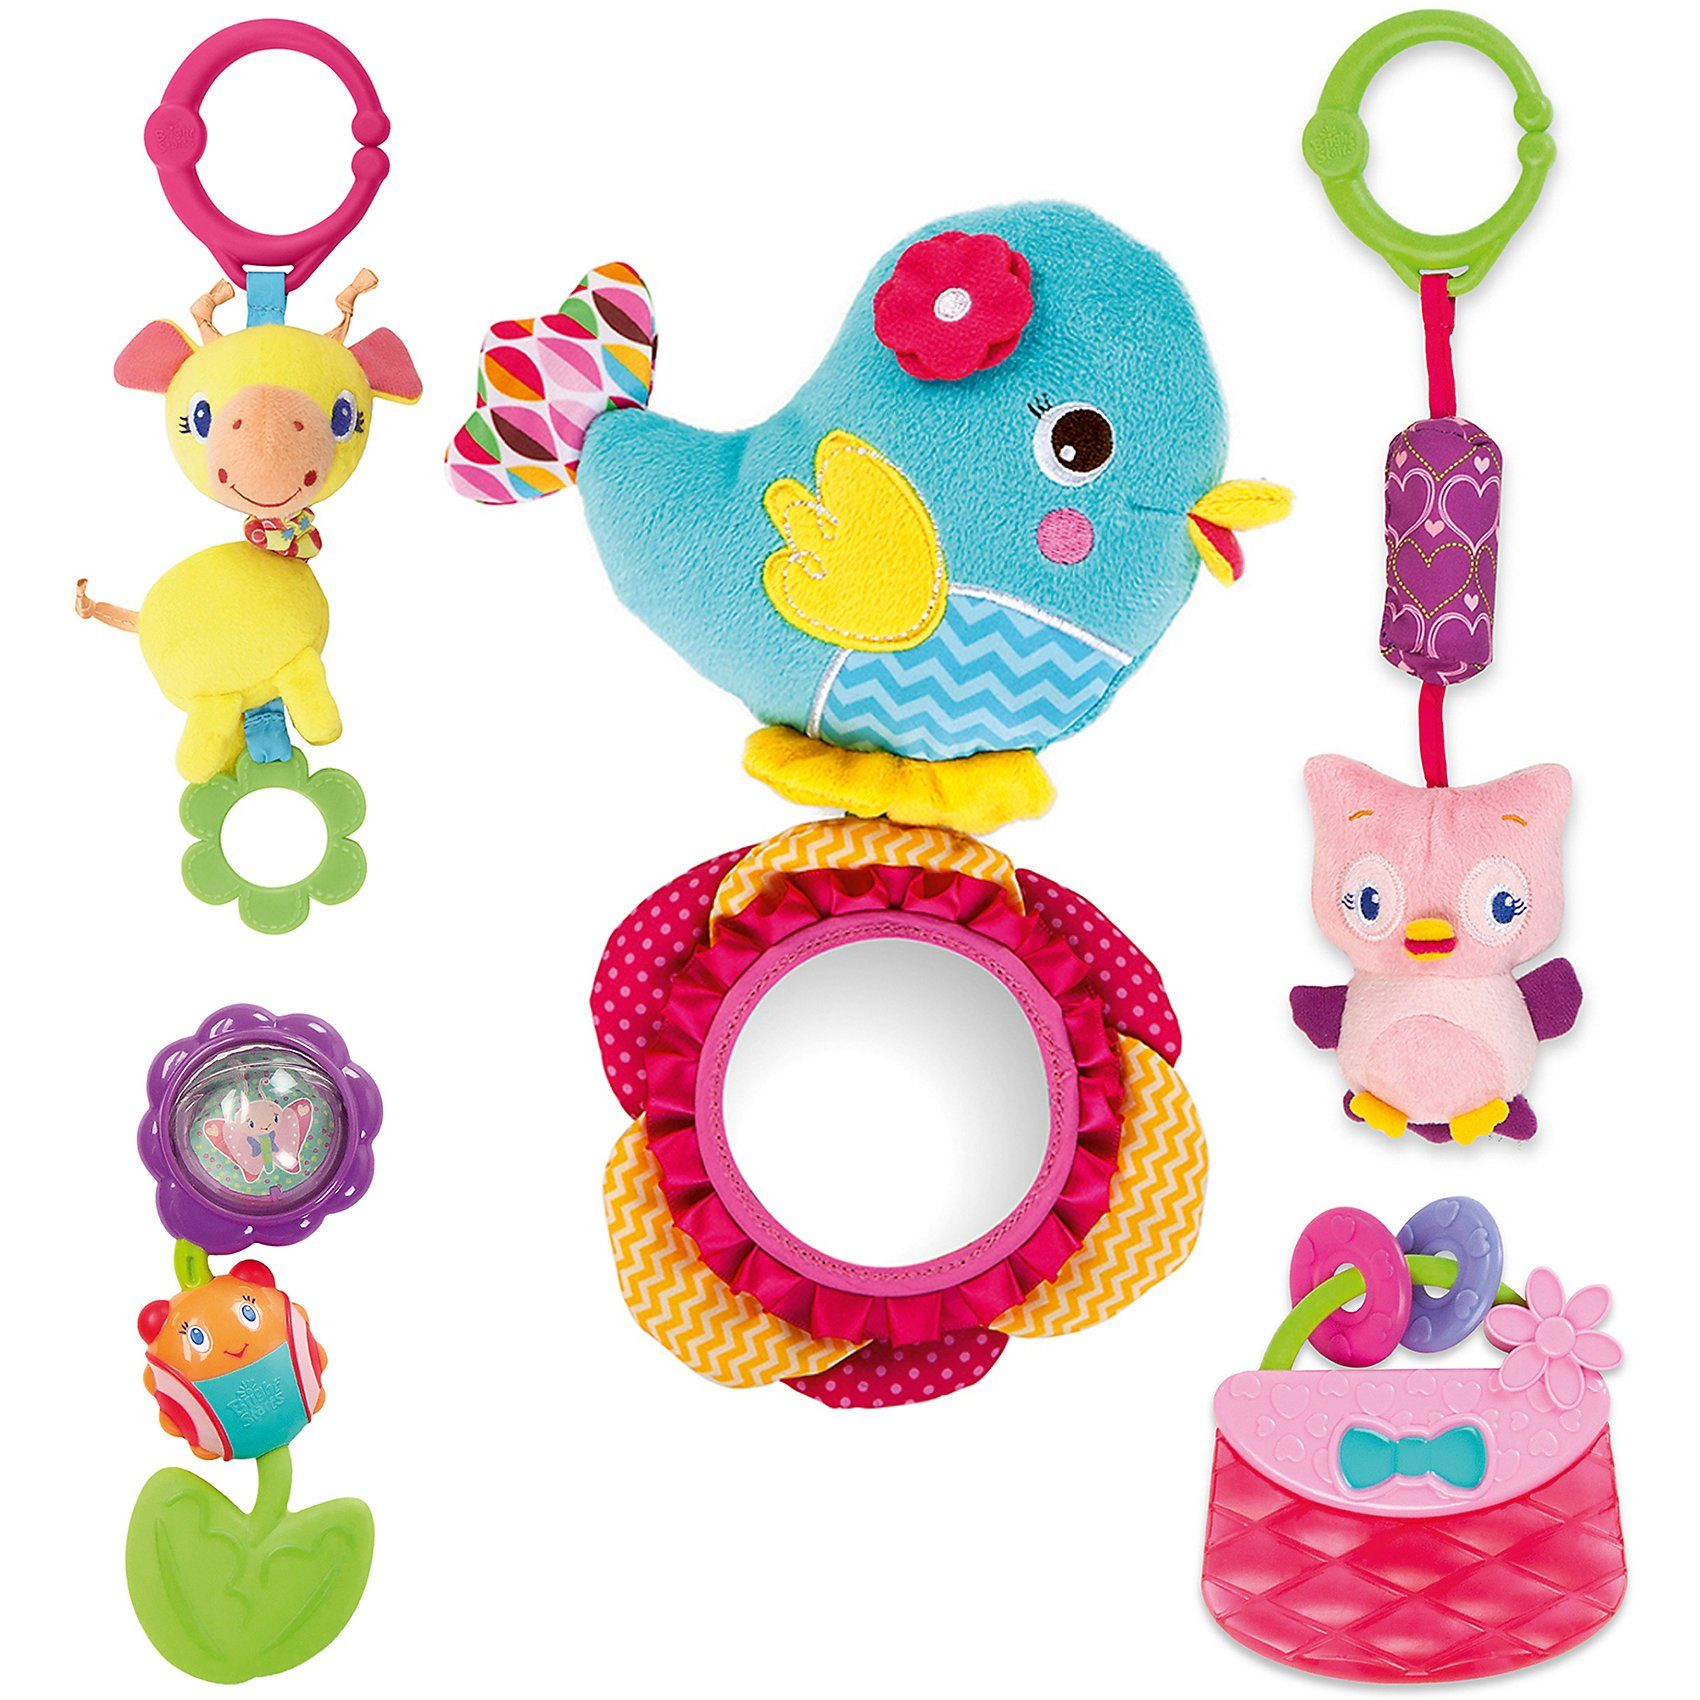 Kids II Bright Starts Geschenkset Pinke Vögel